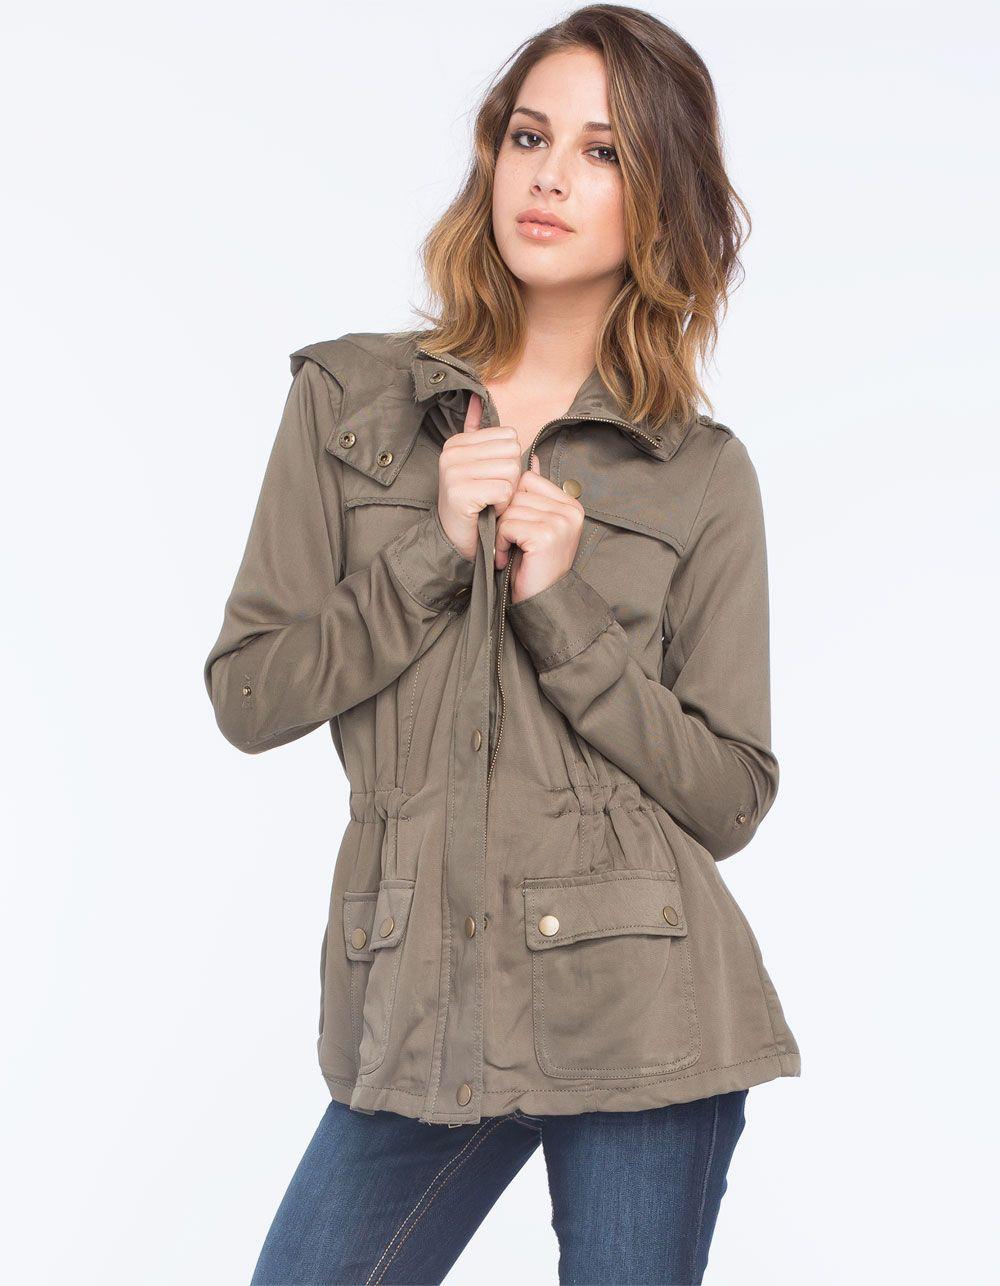 Ashley Button Flap Womens Anorak Jacket Jackets Anorak Jacket Olive Green Anorak Jacket Anorak [ 1286 x 1000 Pixel ]